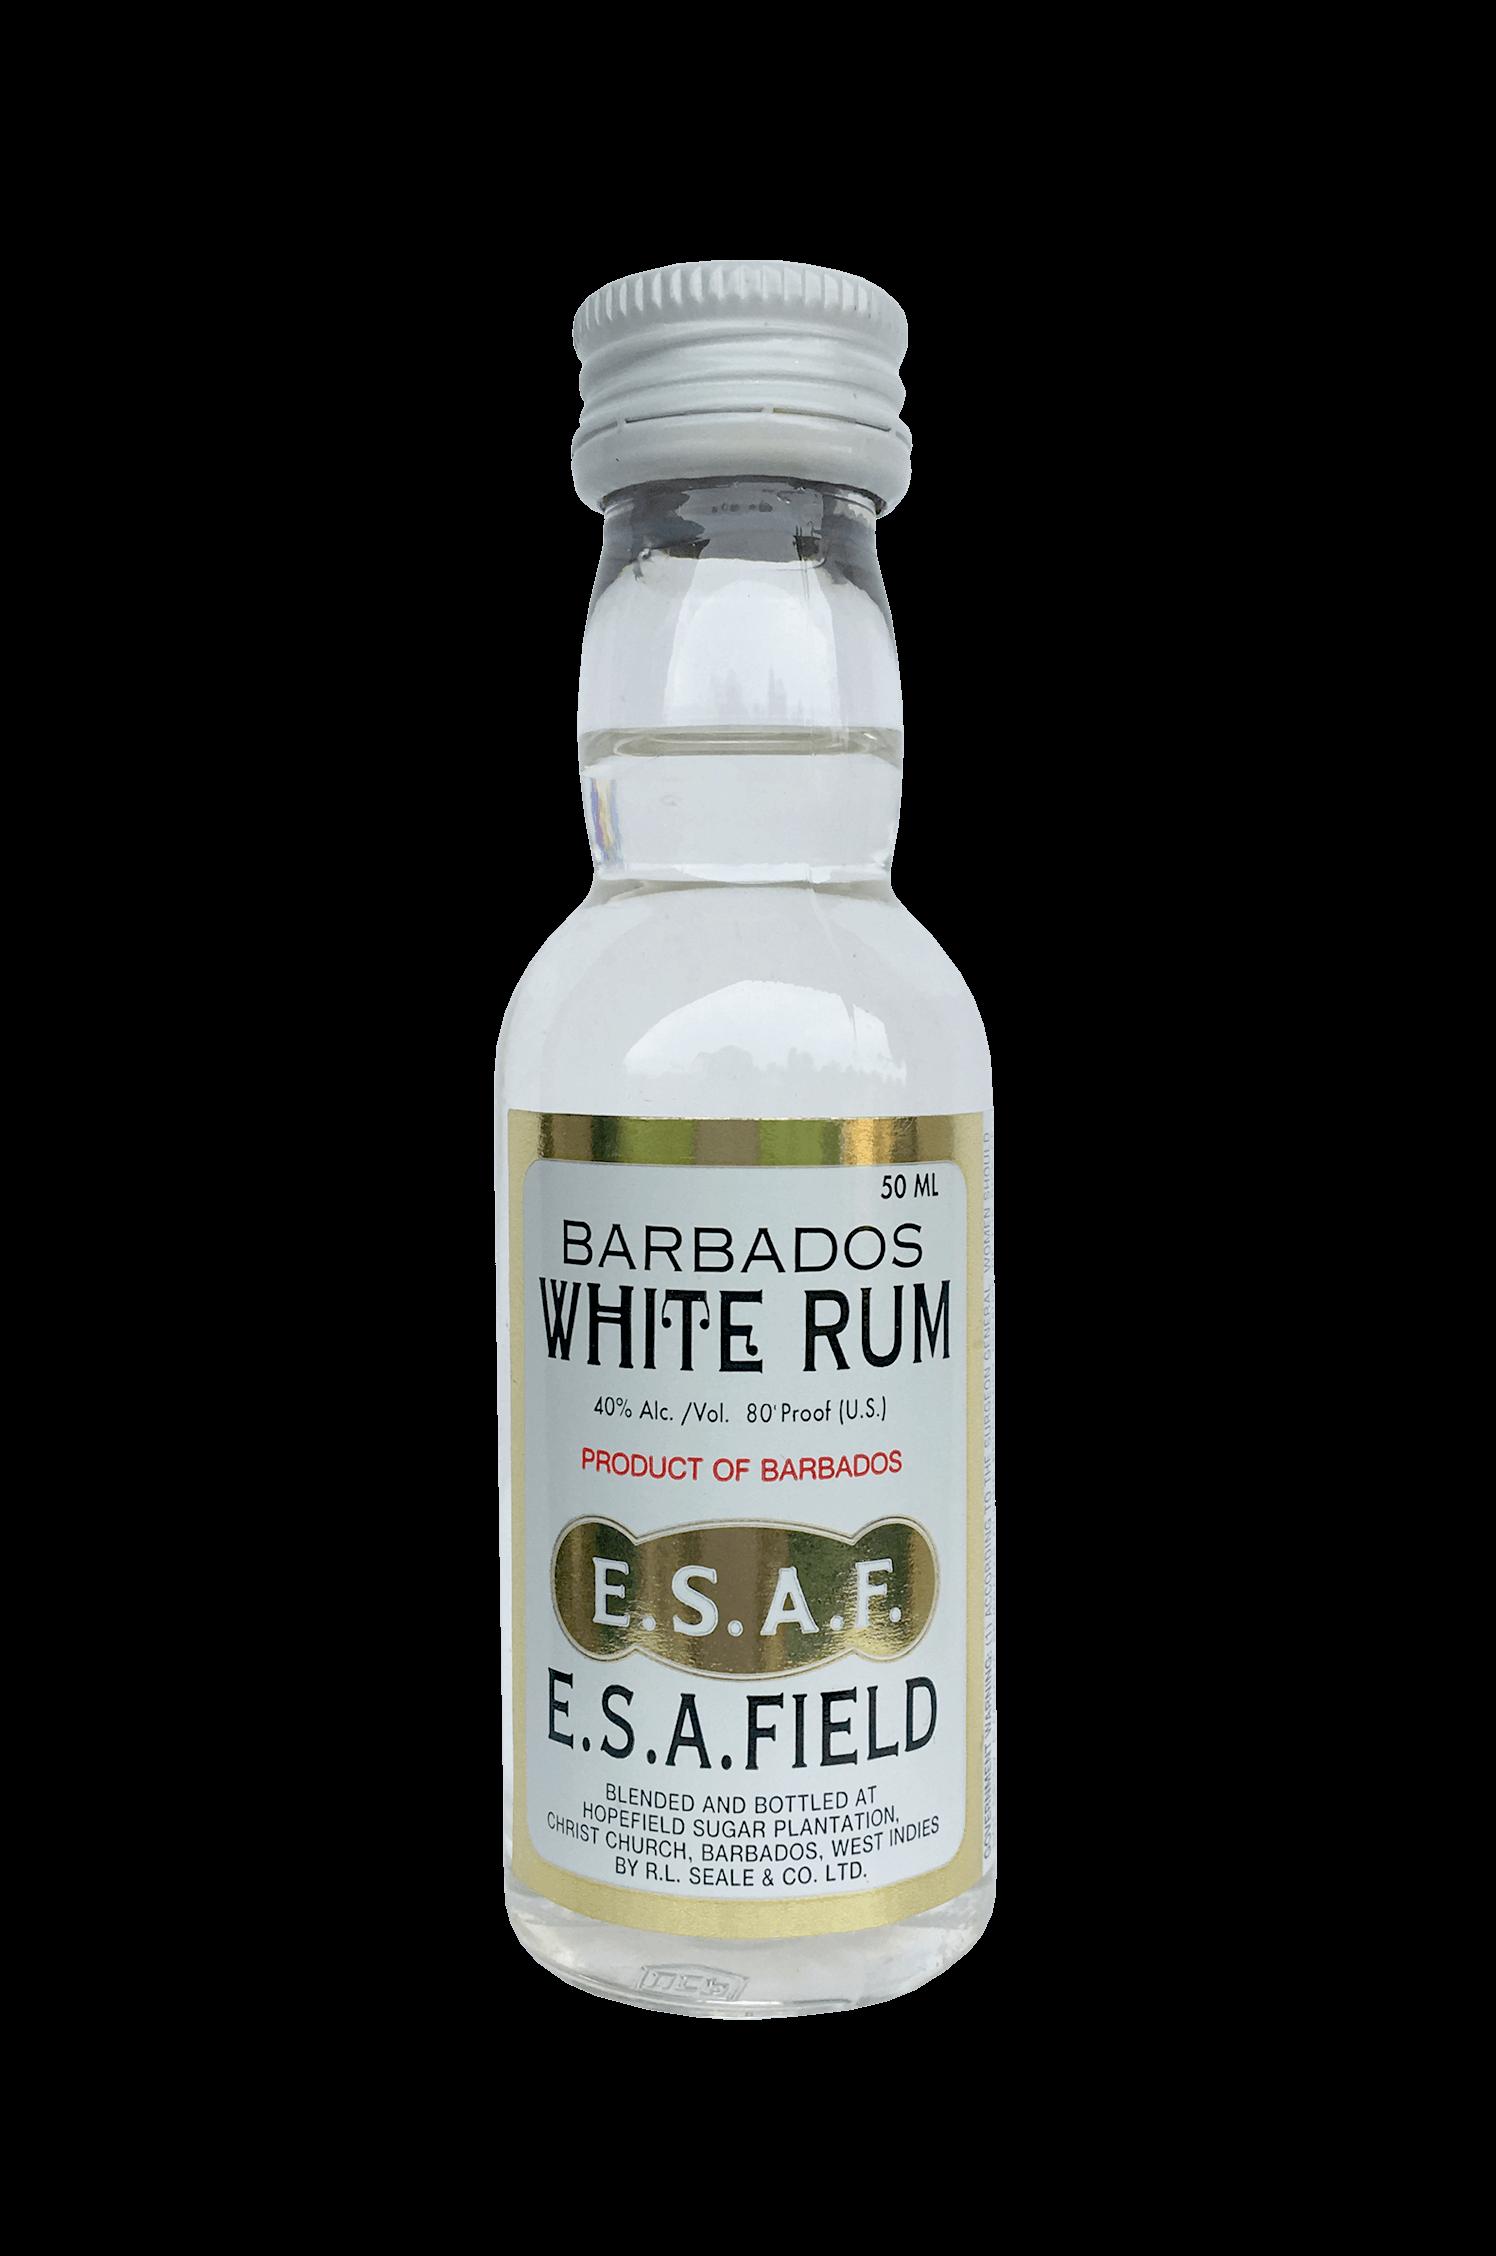 Barbados White Rum E.S.A.F.